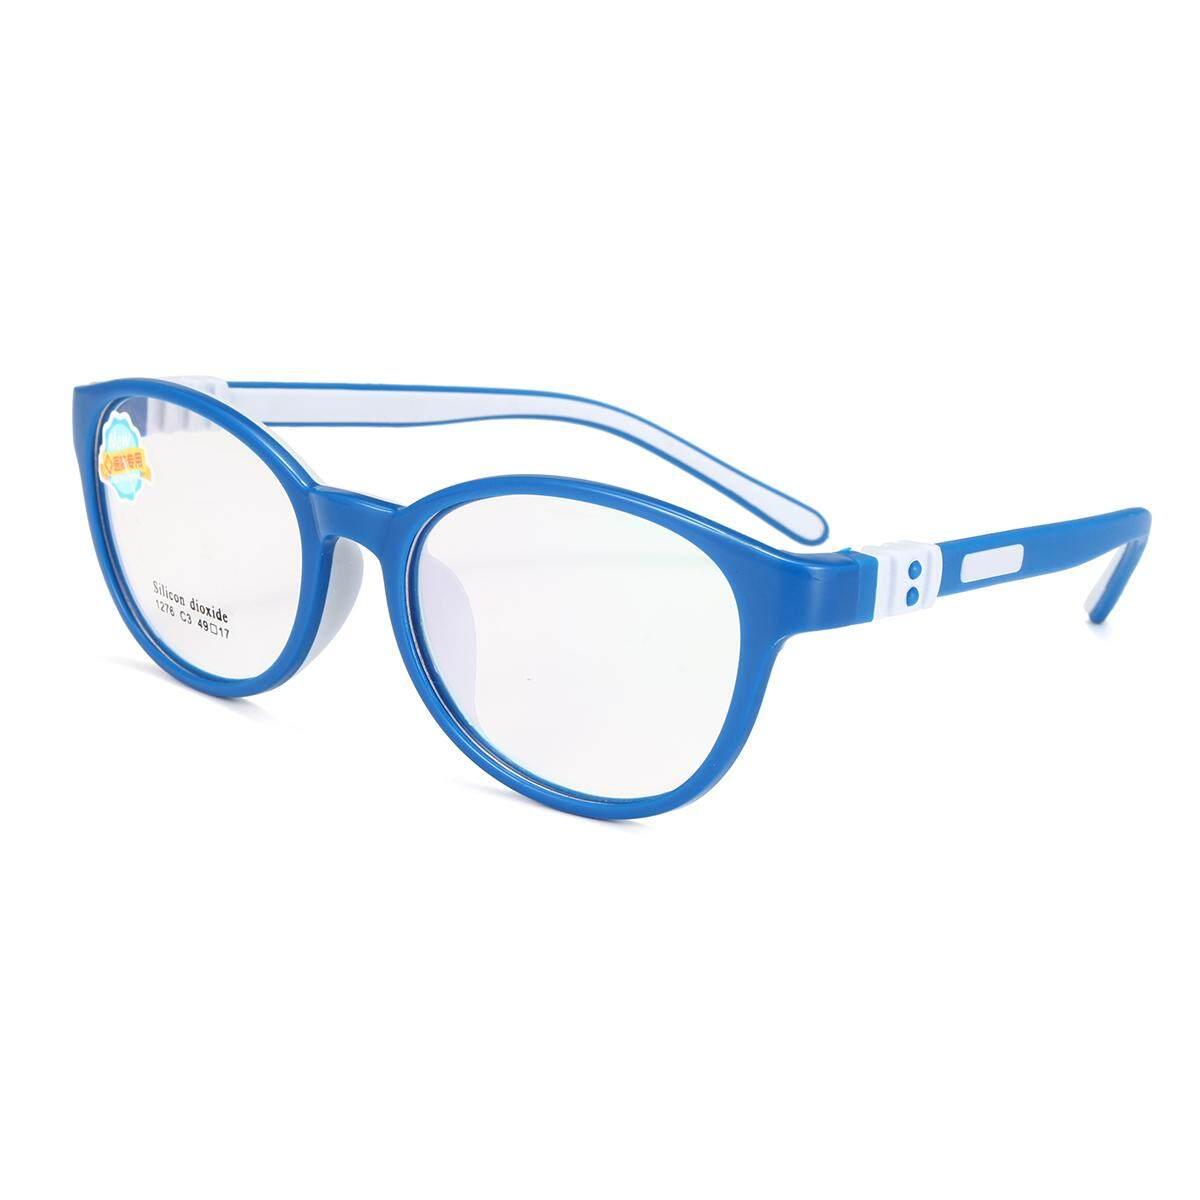 4b24e608d2 Child s Children Girl Boy Silicone Flexible Eyeglasses Frames Myopia Glasses  RX